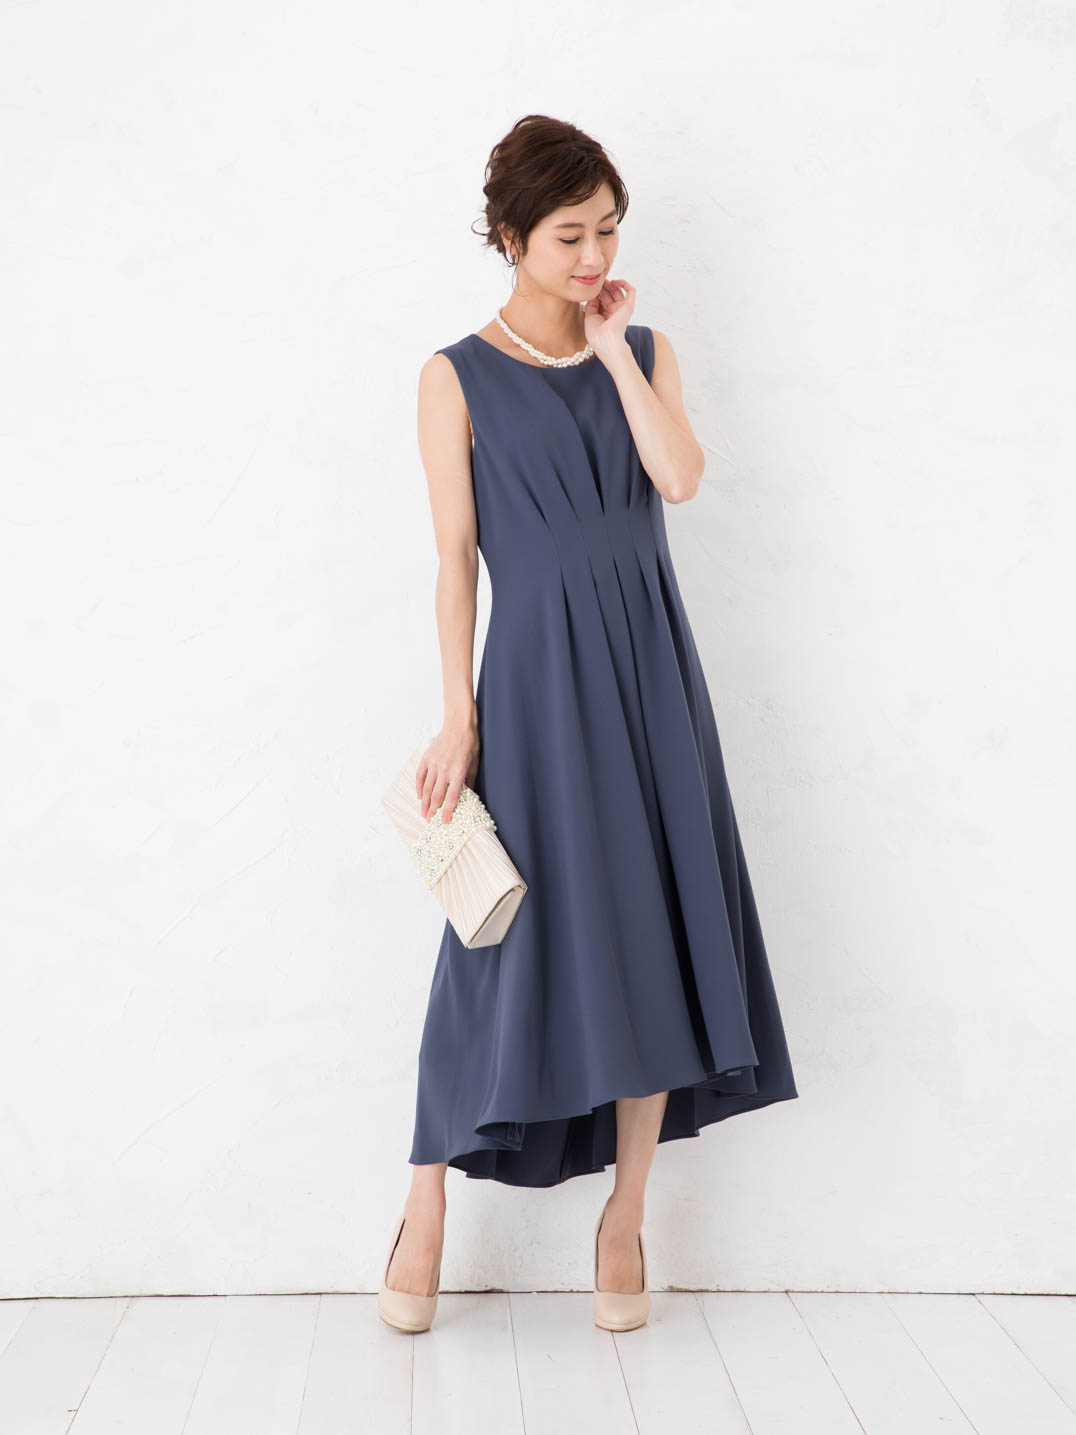 REPLETE ドレス / Lサイズ (DOC0136)